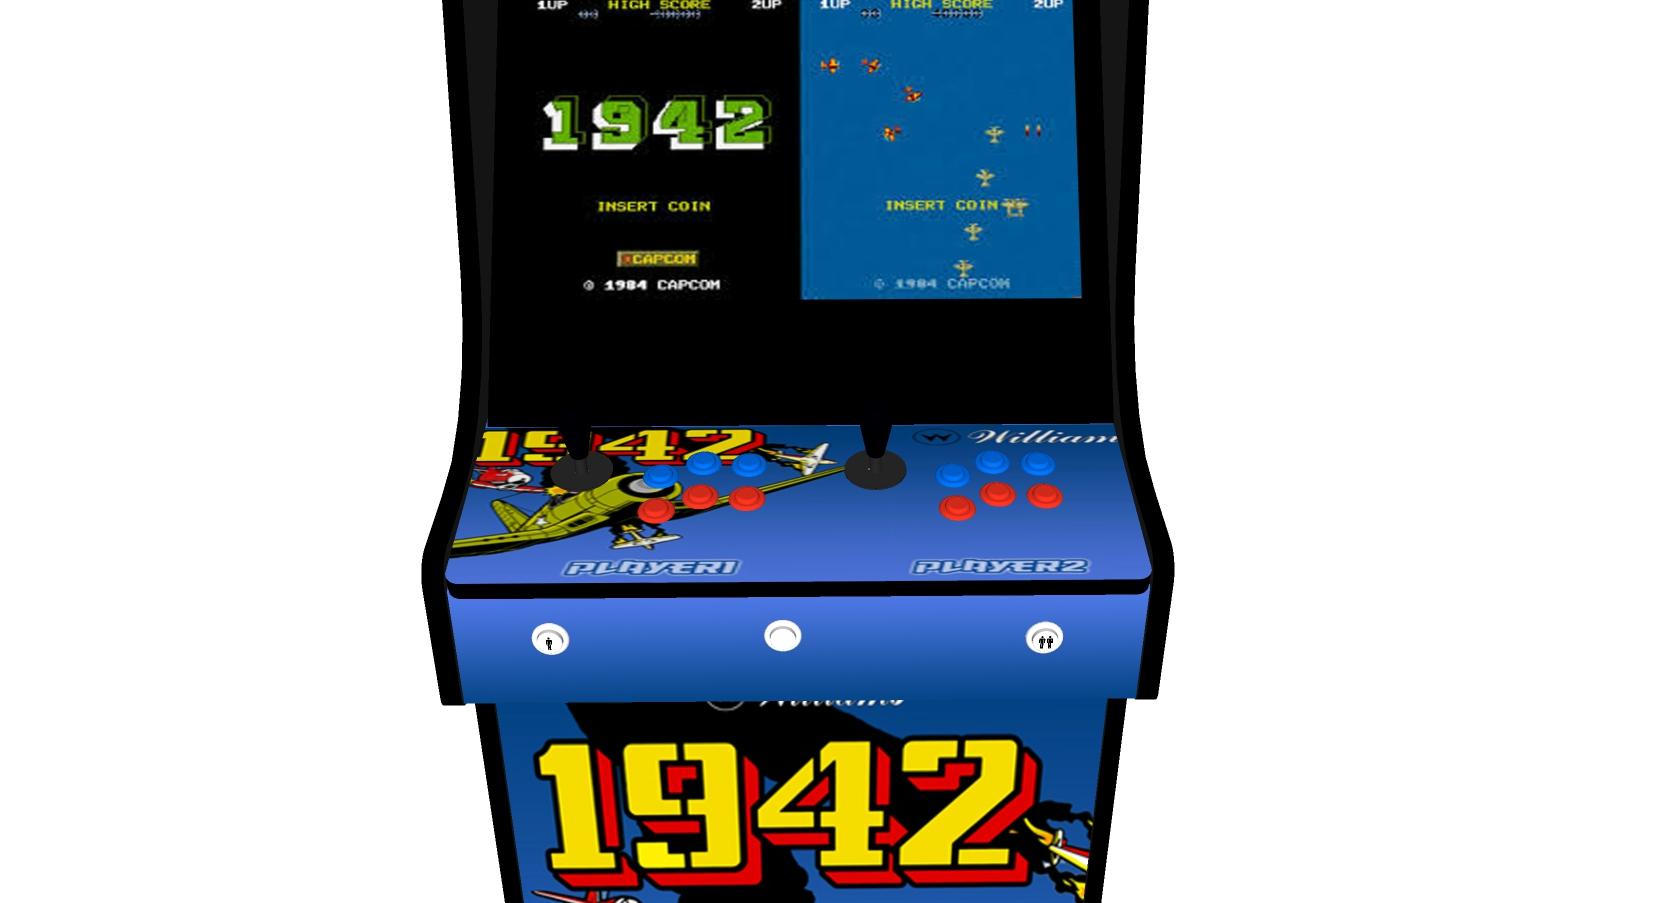 Classic Upright Arcade Machine - 1942 Theme - Buttons